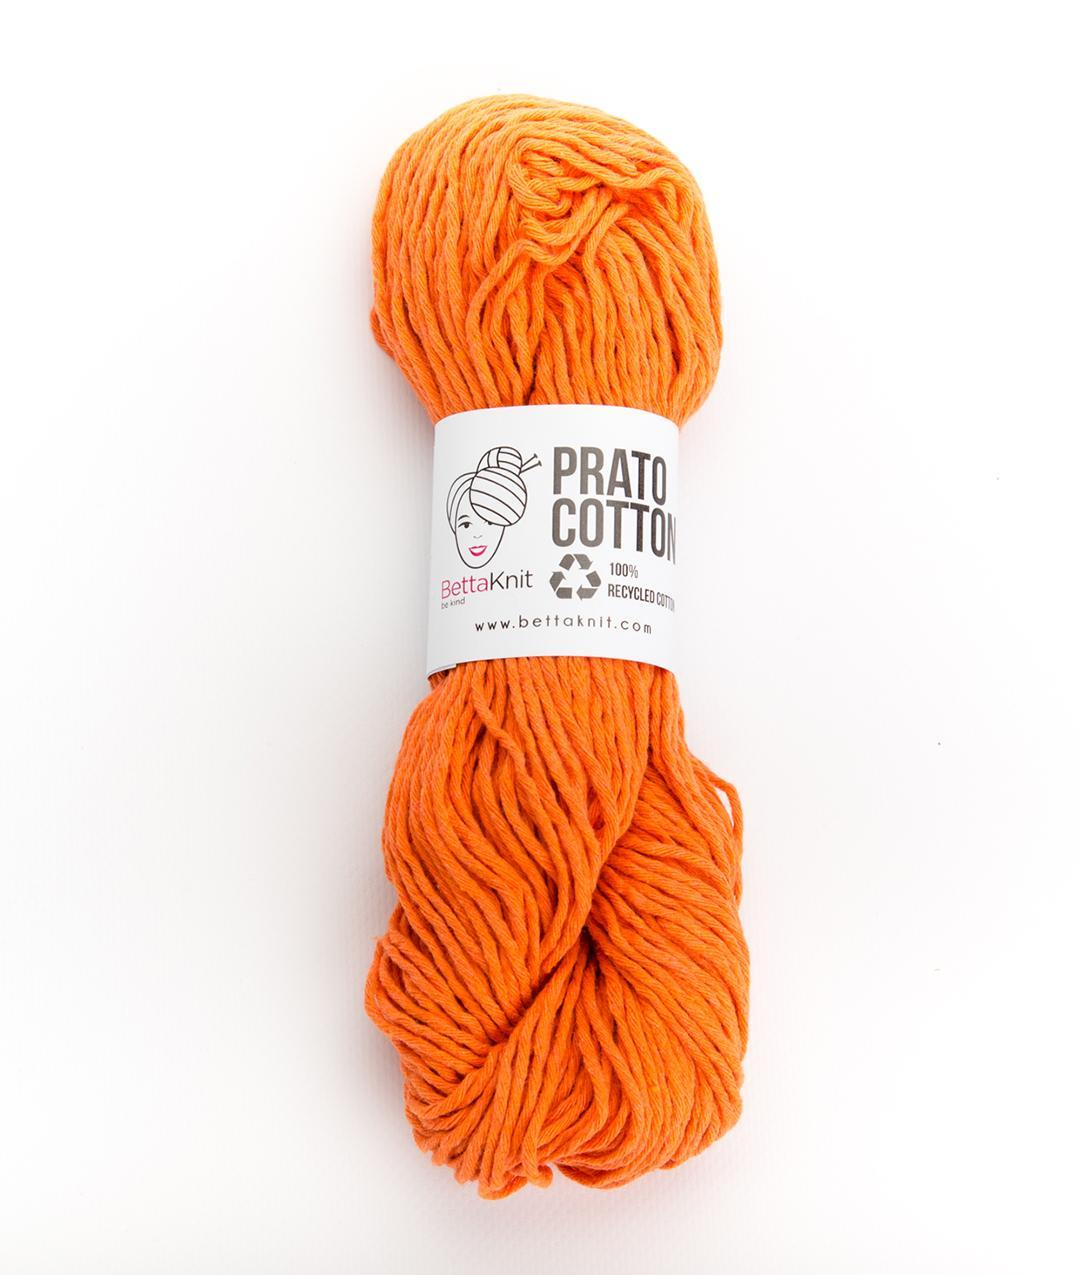 Prato Cotton